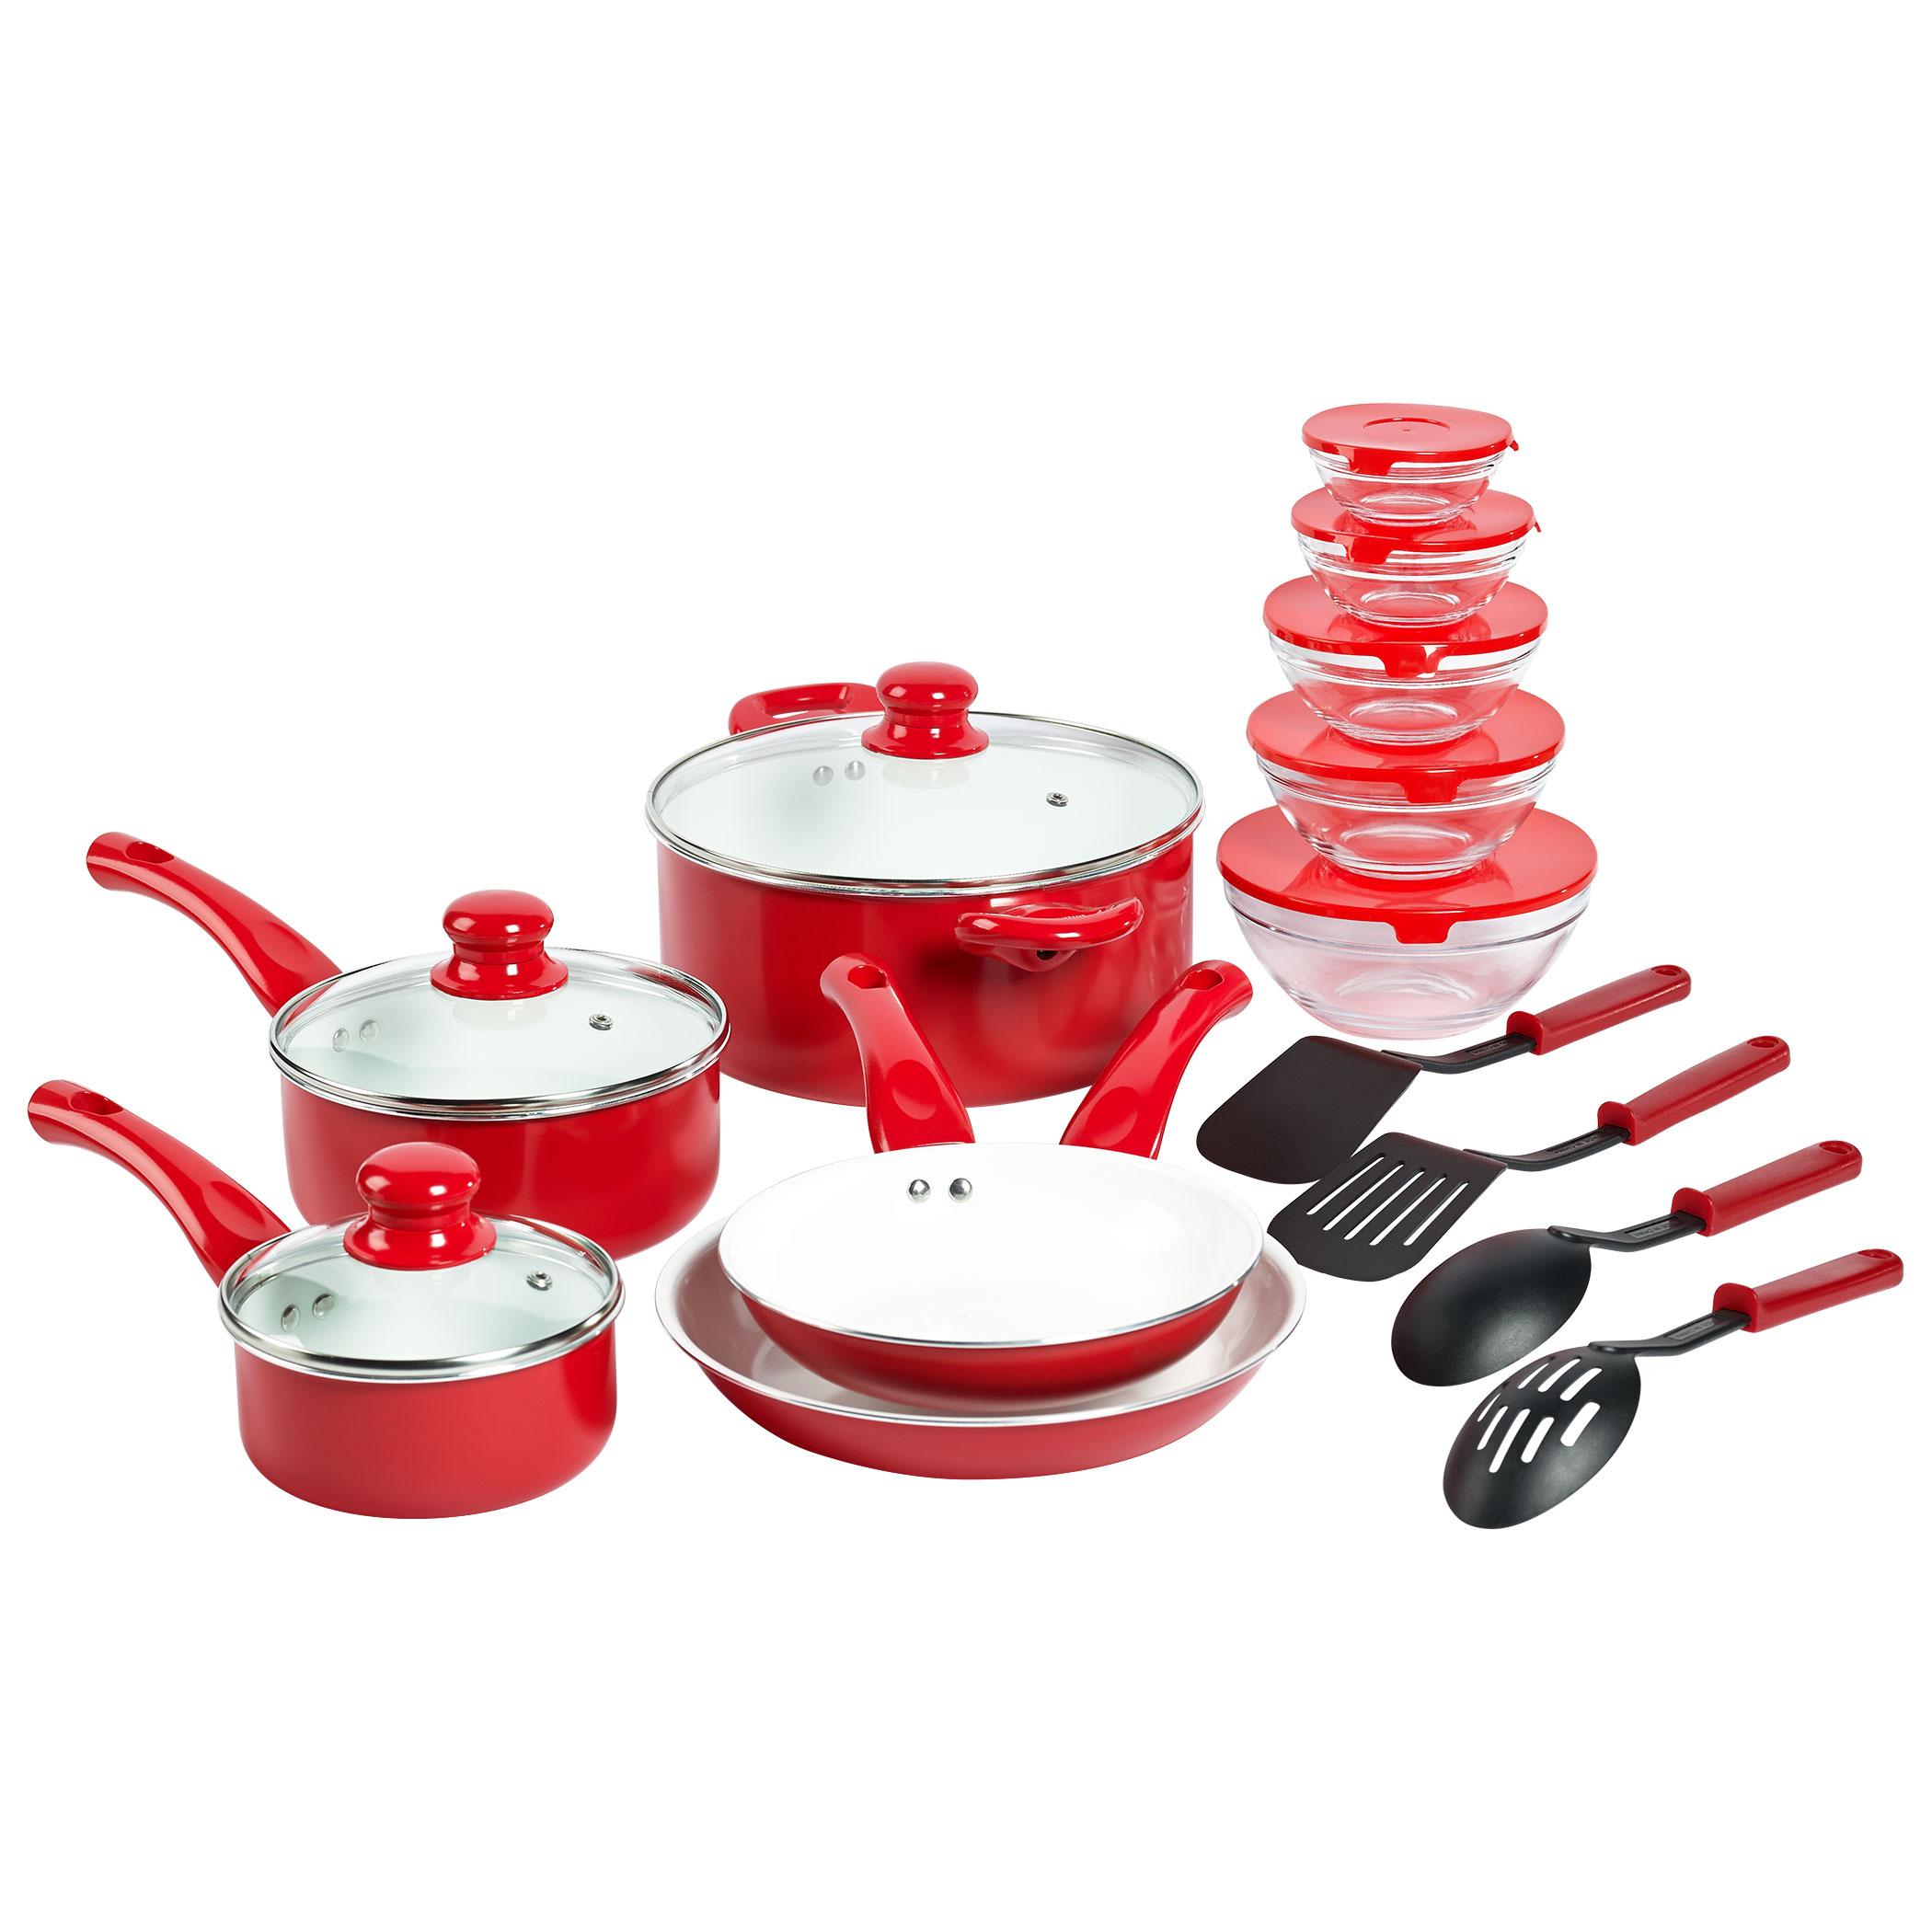 aa89e63f1 17 piece Ceramic Non-Stick Aluminum Cookware Set by Basic Essentials ...